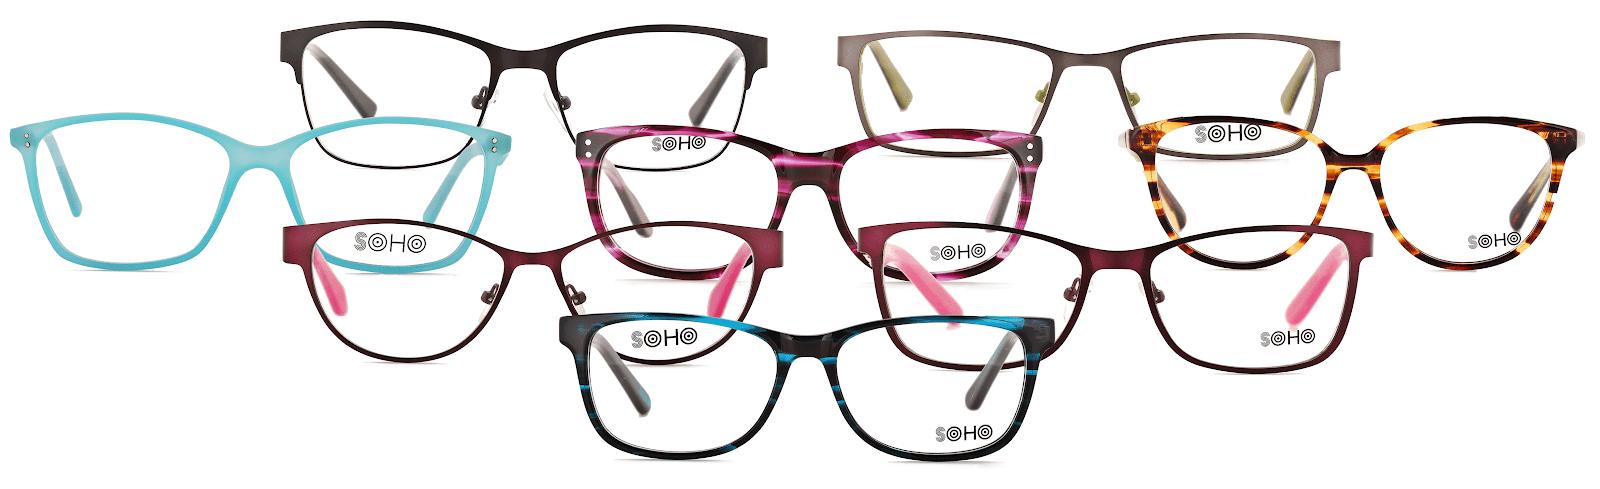 Importancia de renovar gafas graduadas